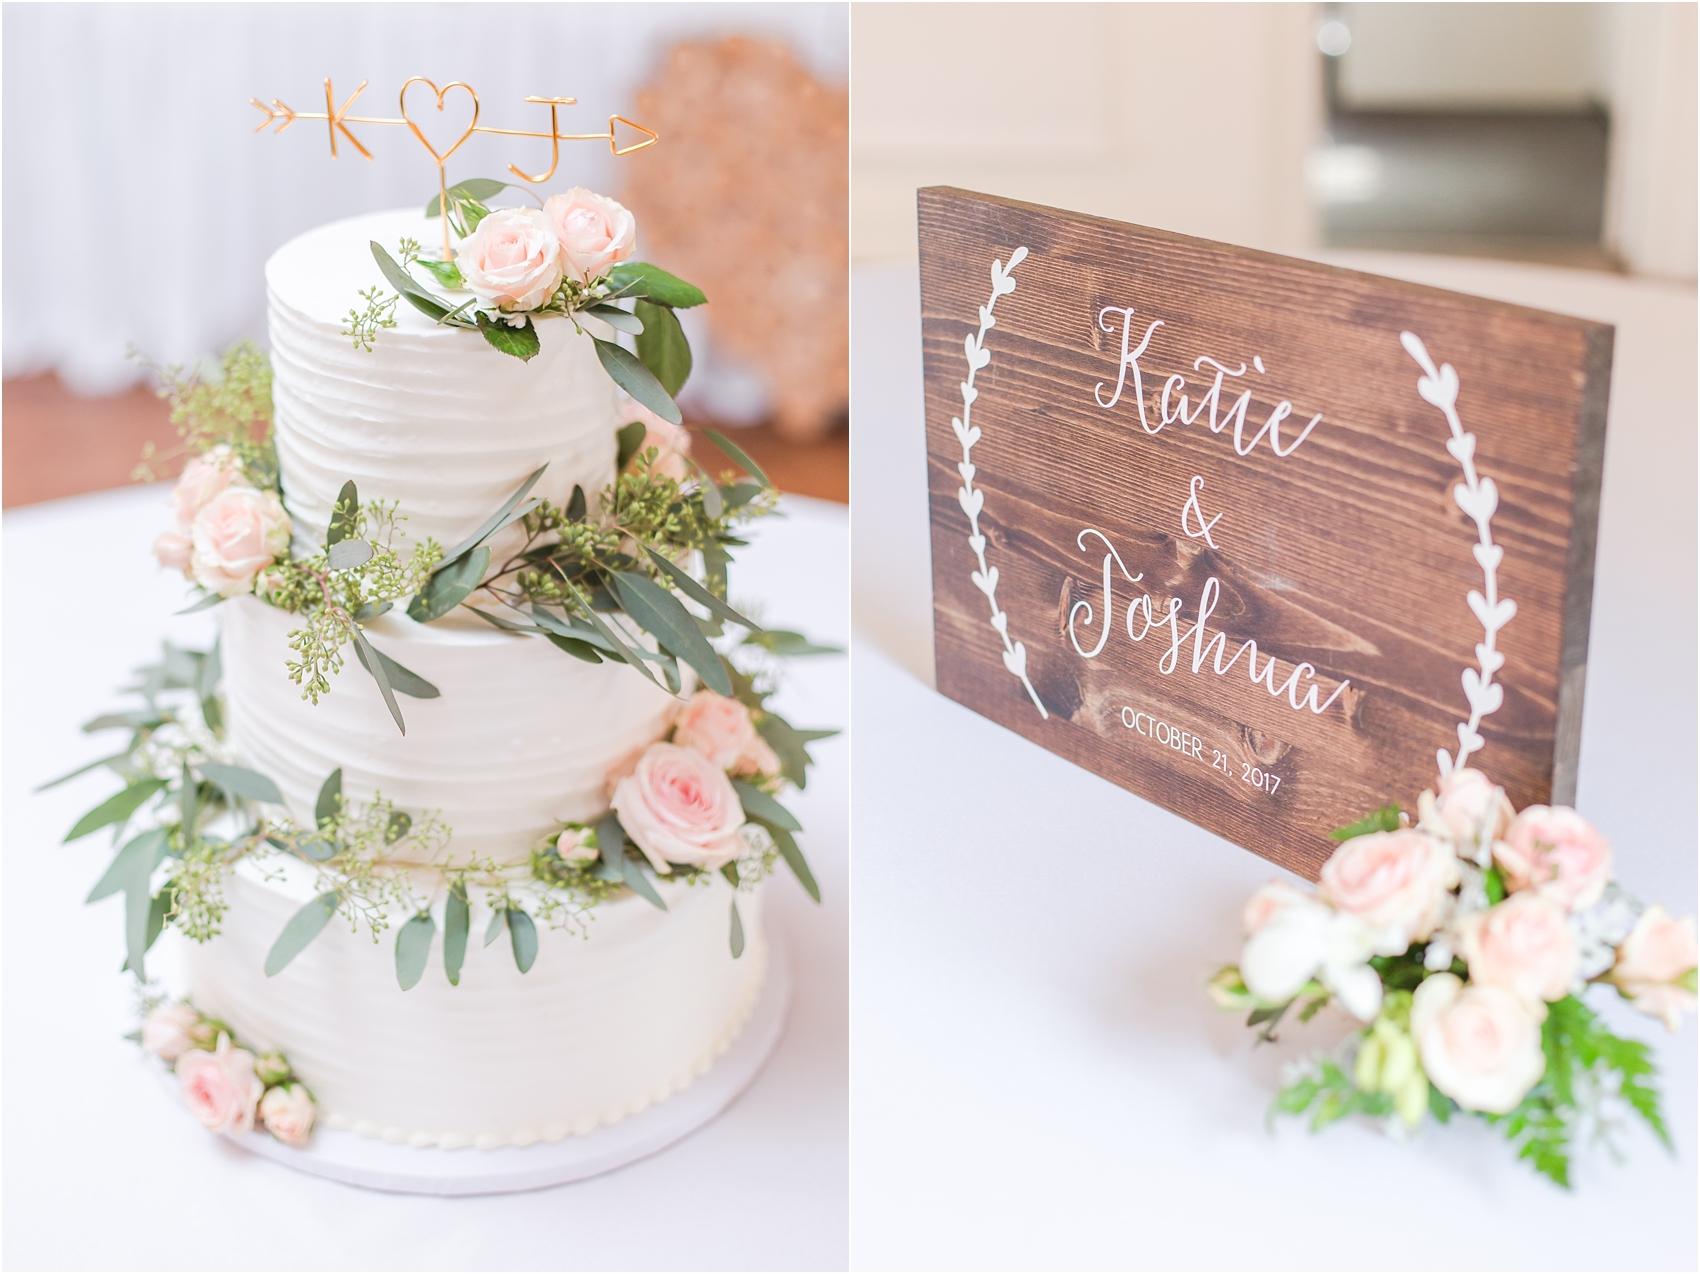 elegant-and-romantic-fall-wedding-photos-at-st-marys-catholic-church-in-monroe-michigan-by-courtney-carolyn-photography_0060.jpg